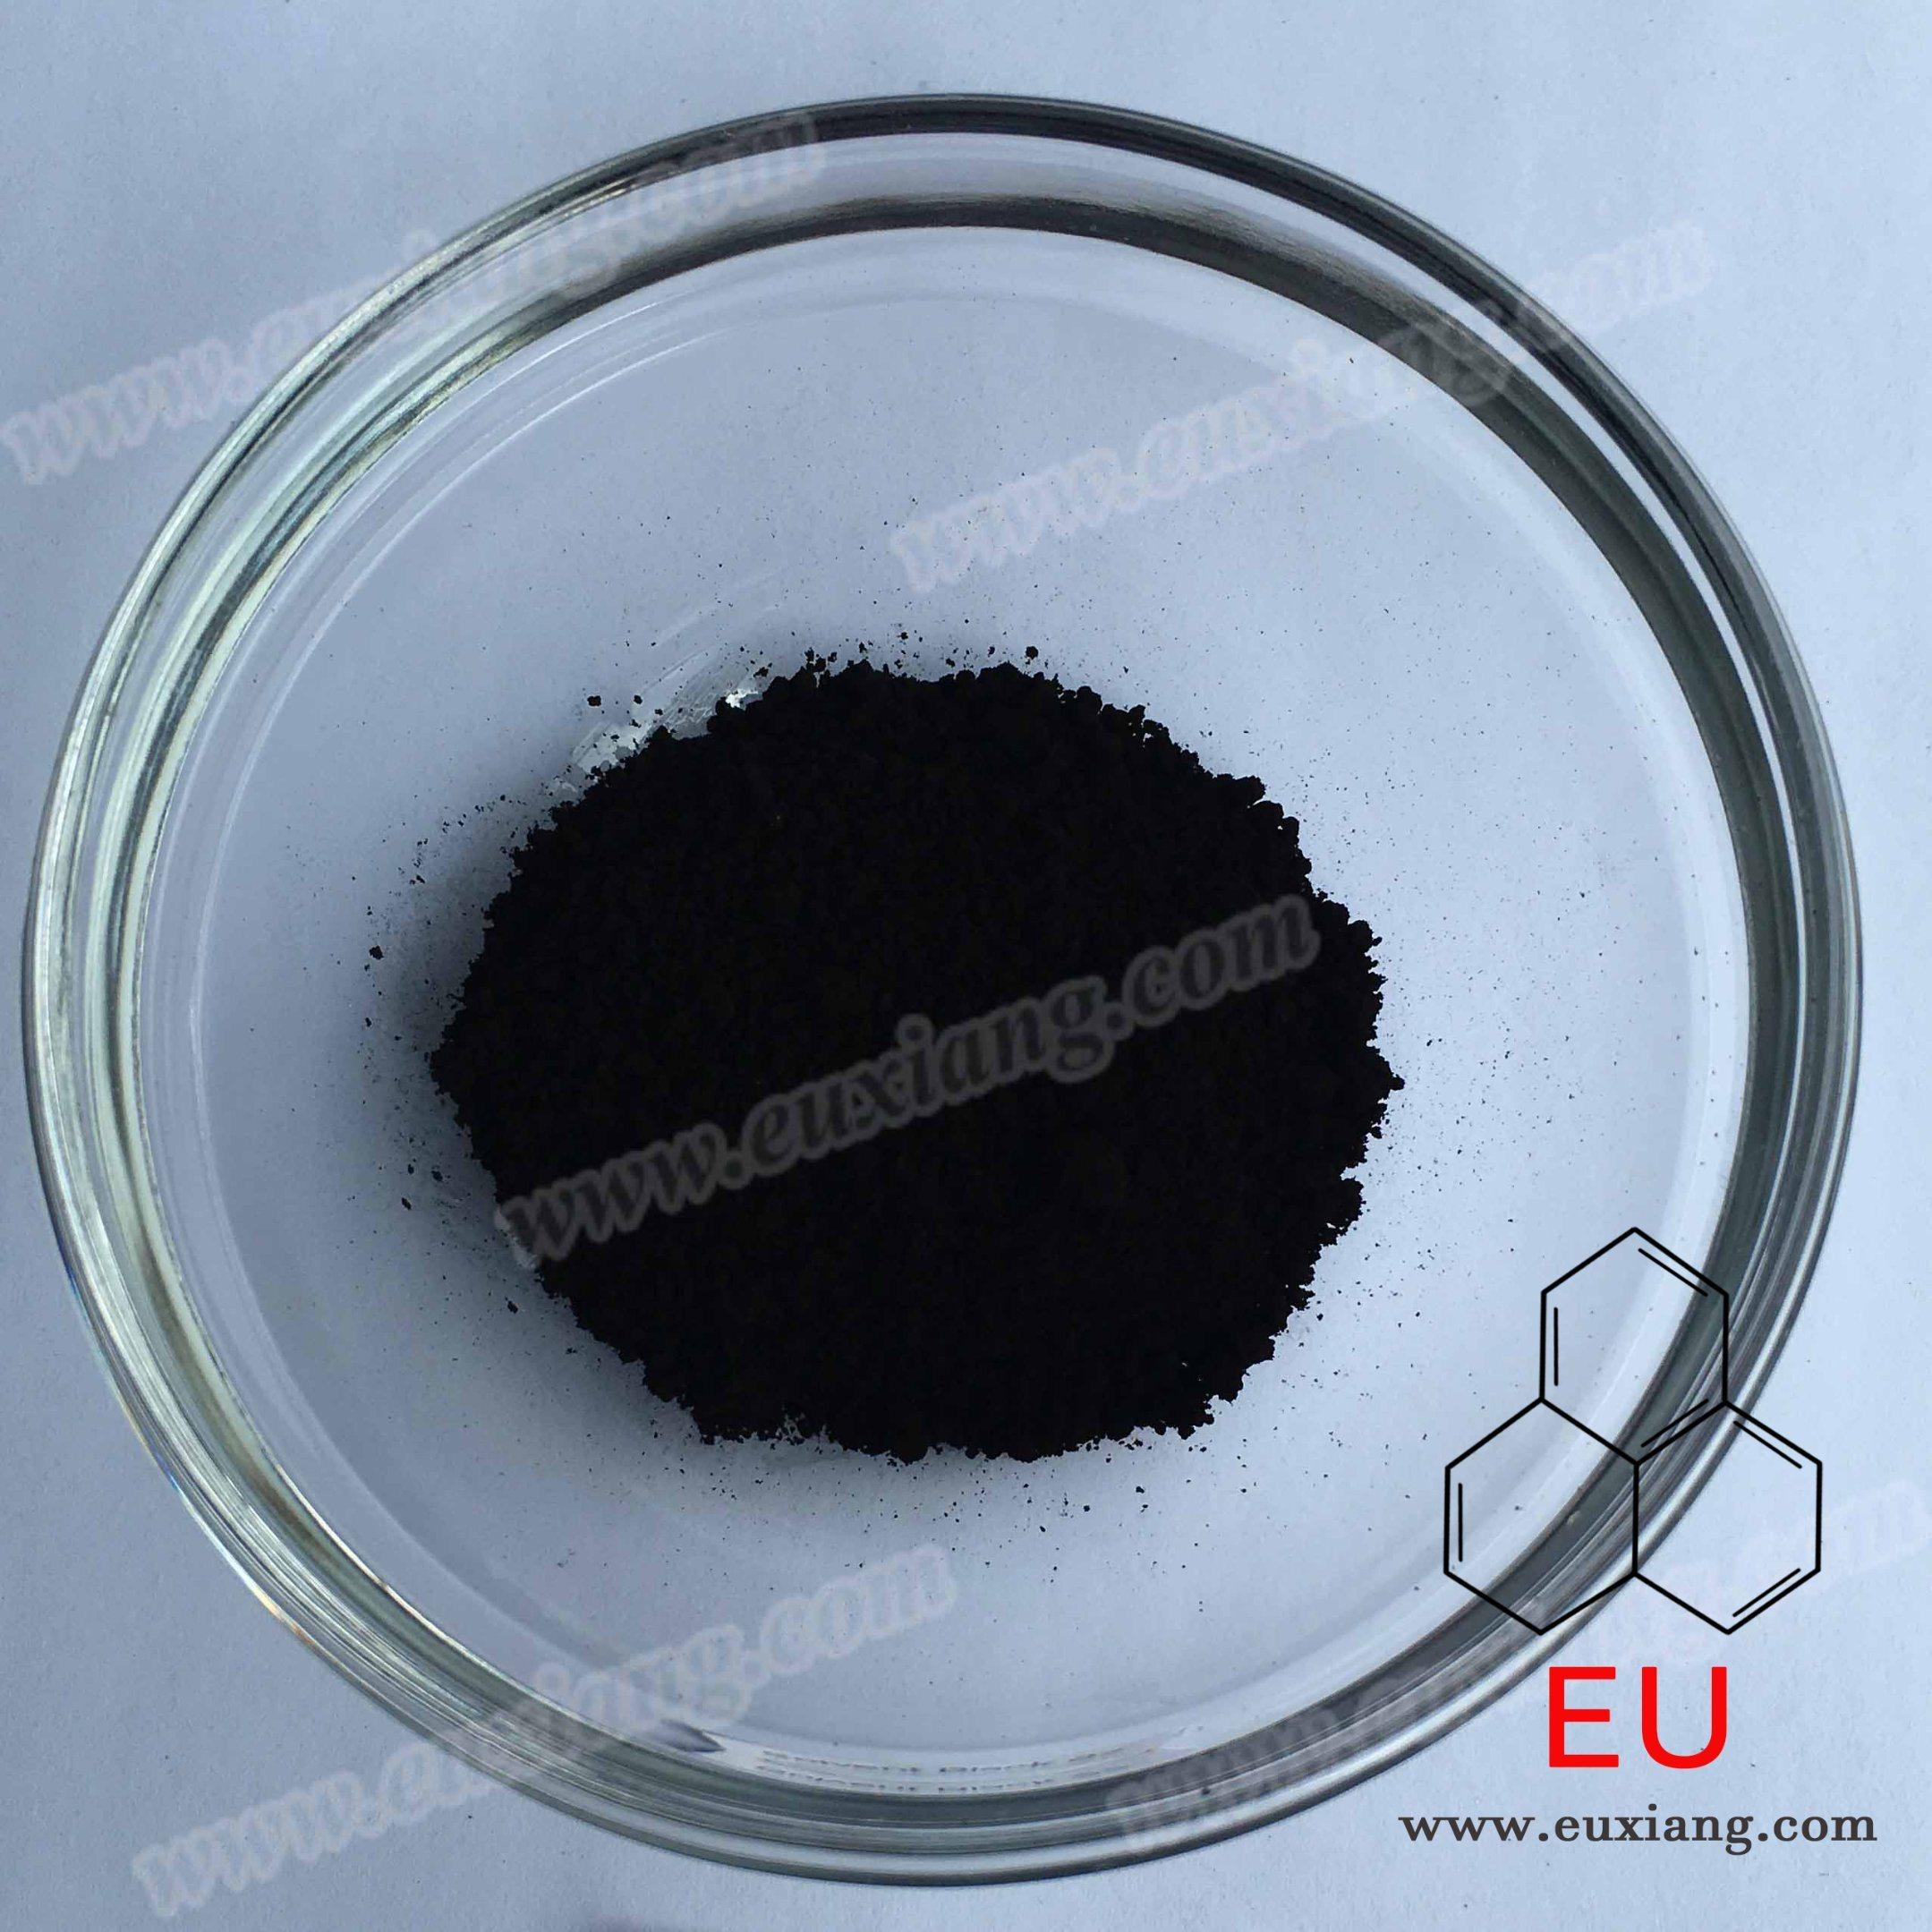 Solvent Dyes Solvent Black 27 for Shoe Polish Dyes